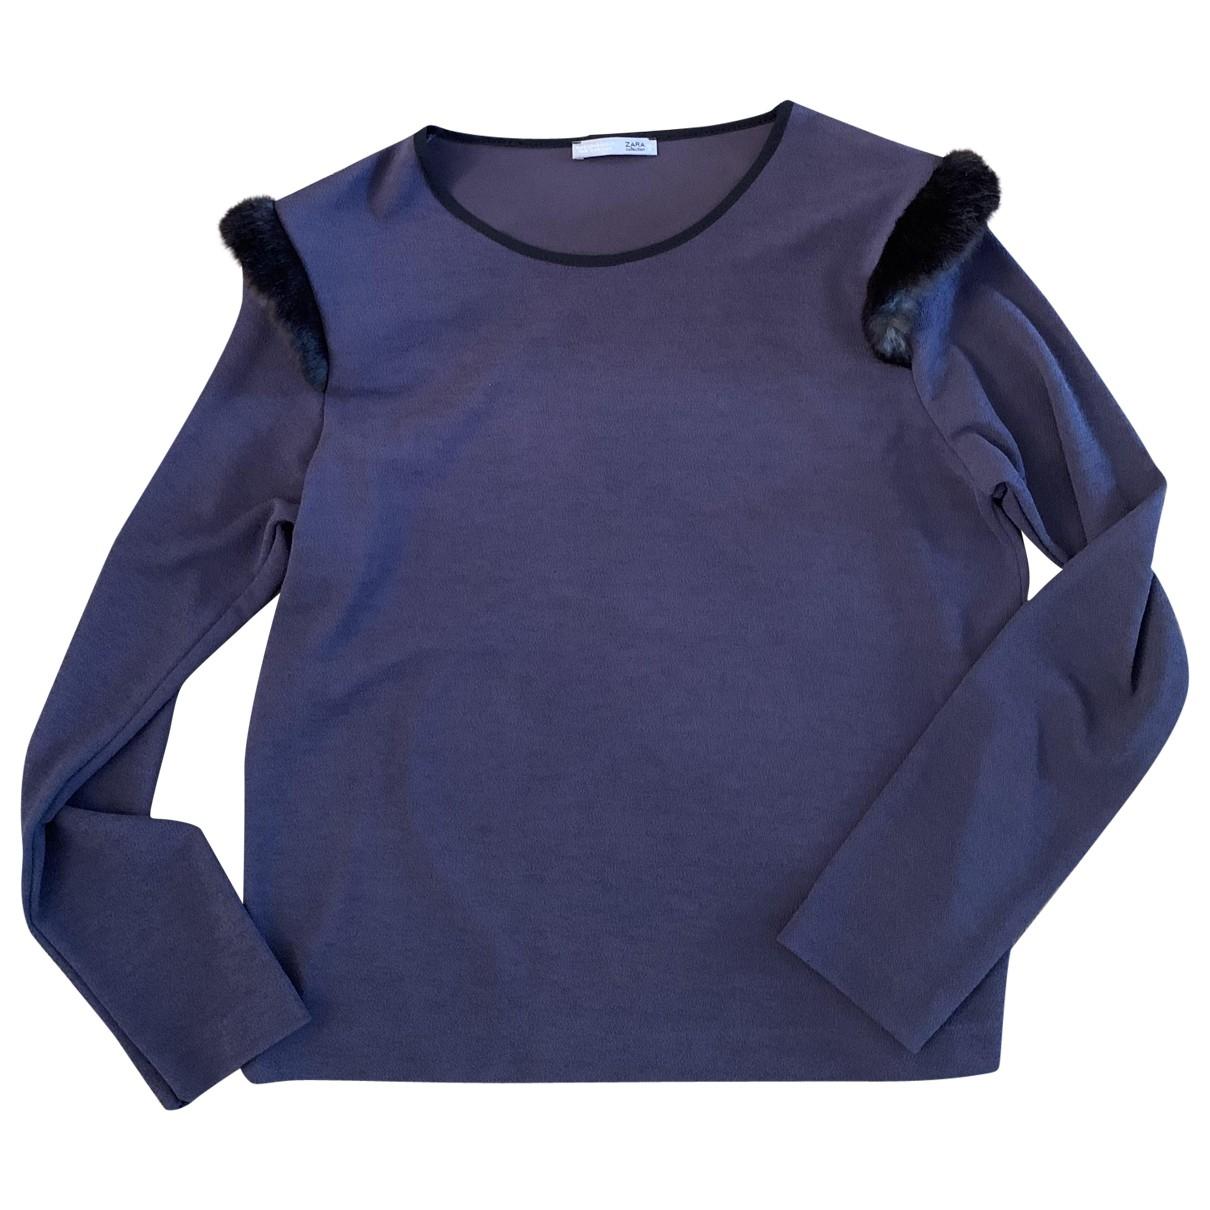 Zara \N Top in  Anthrazit Polyester